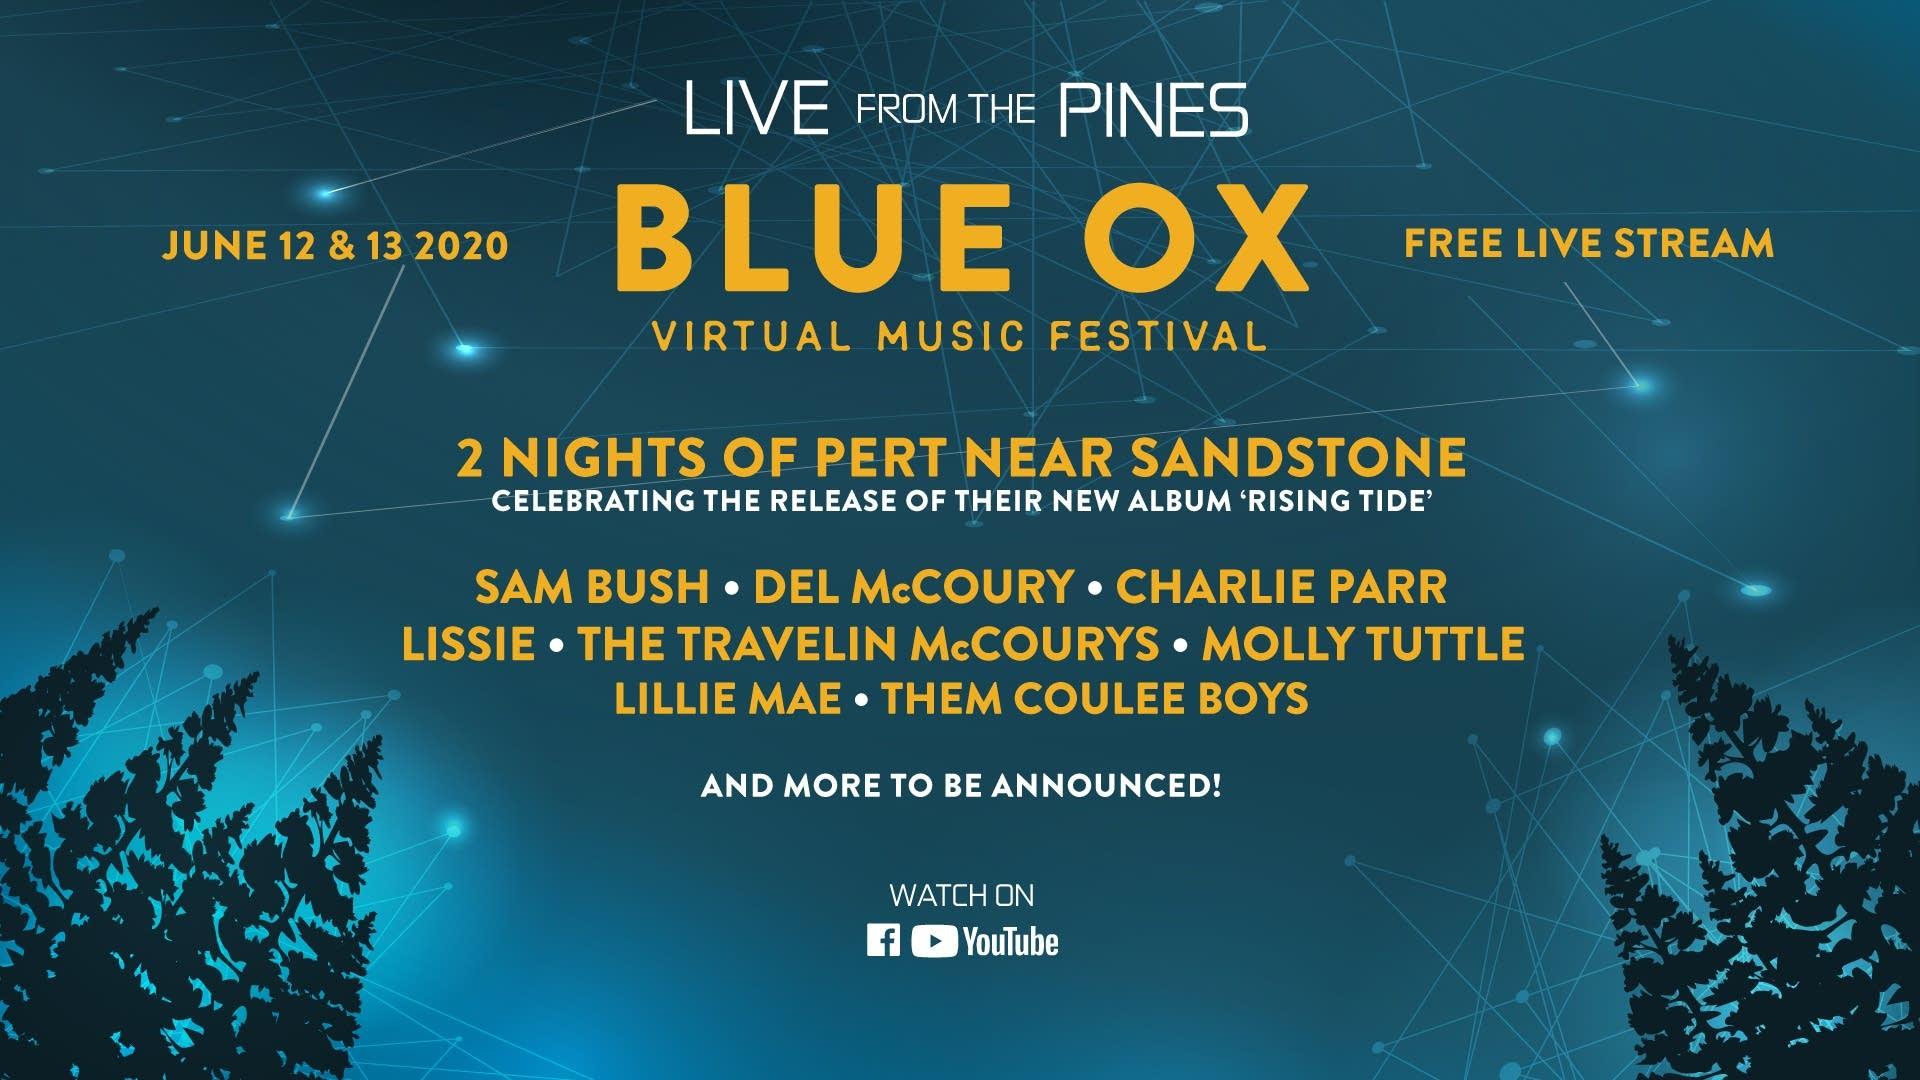 Blue Ox Virtual Music Festival